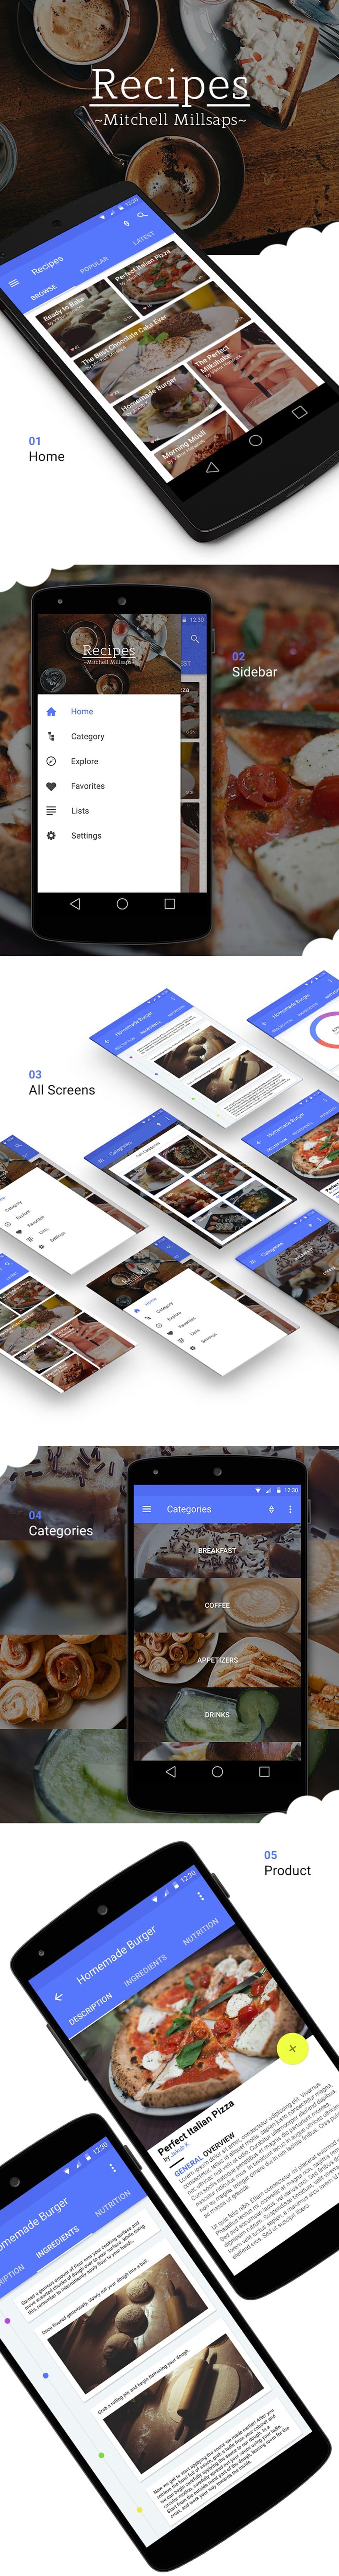 Recipes Material Design Free App Mockup